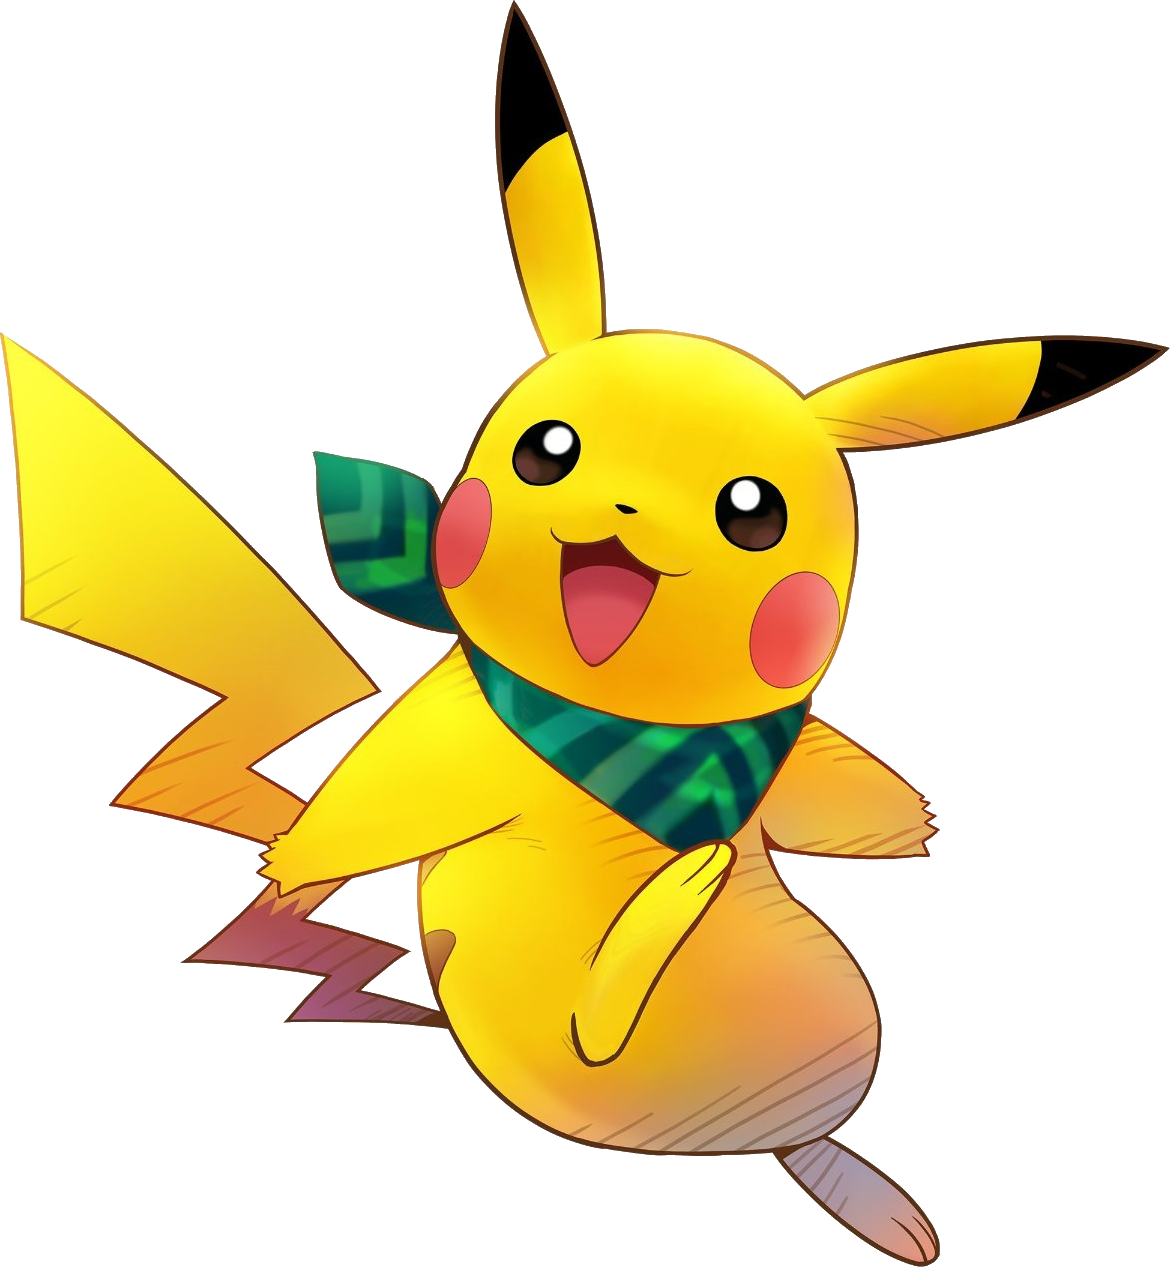 Image 025Pikachu Pokémon Super Mystery Dungeon